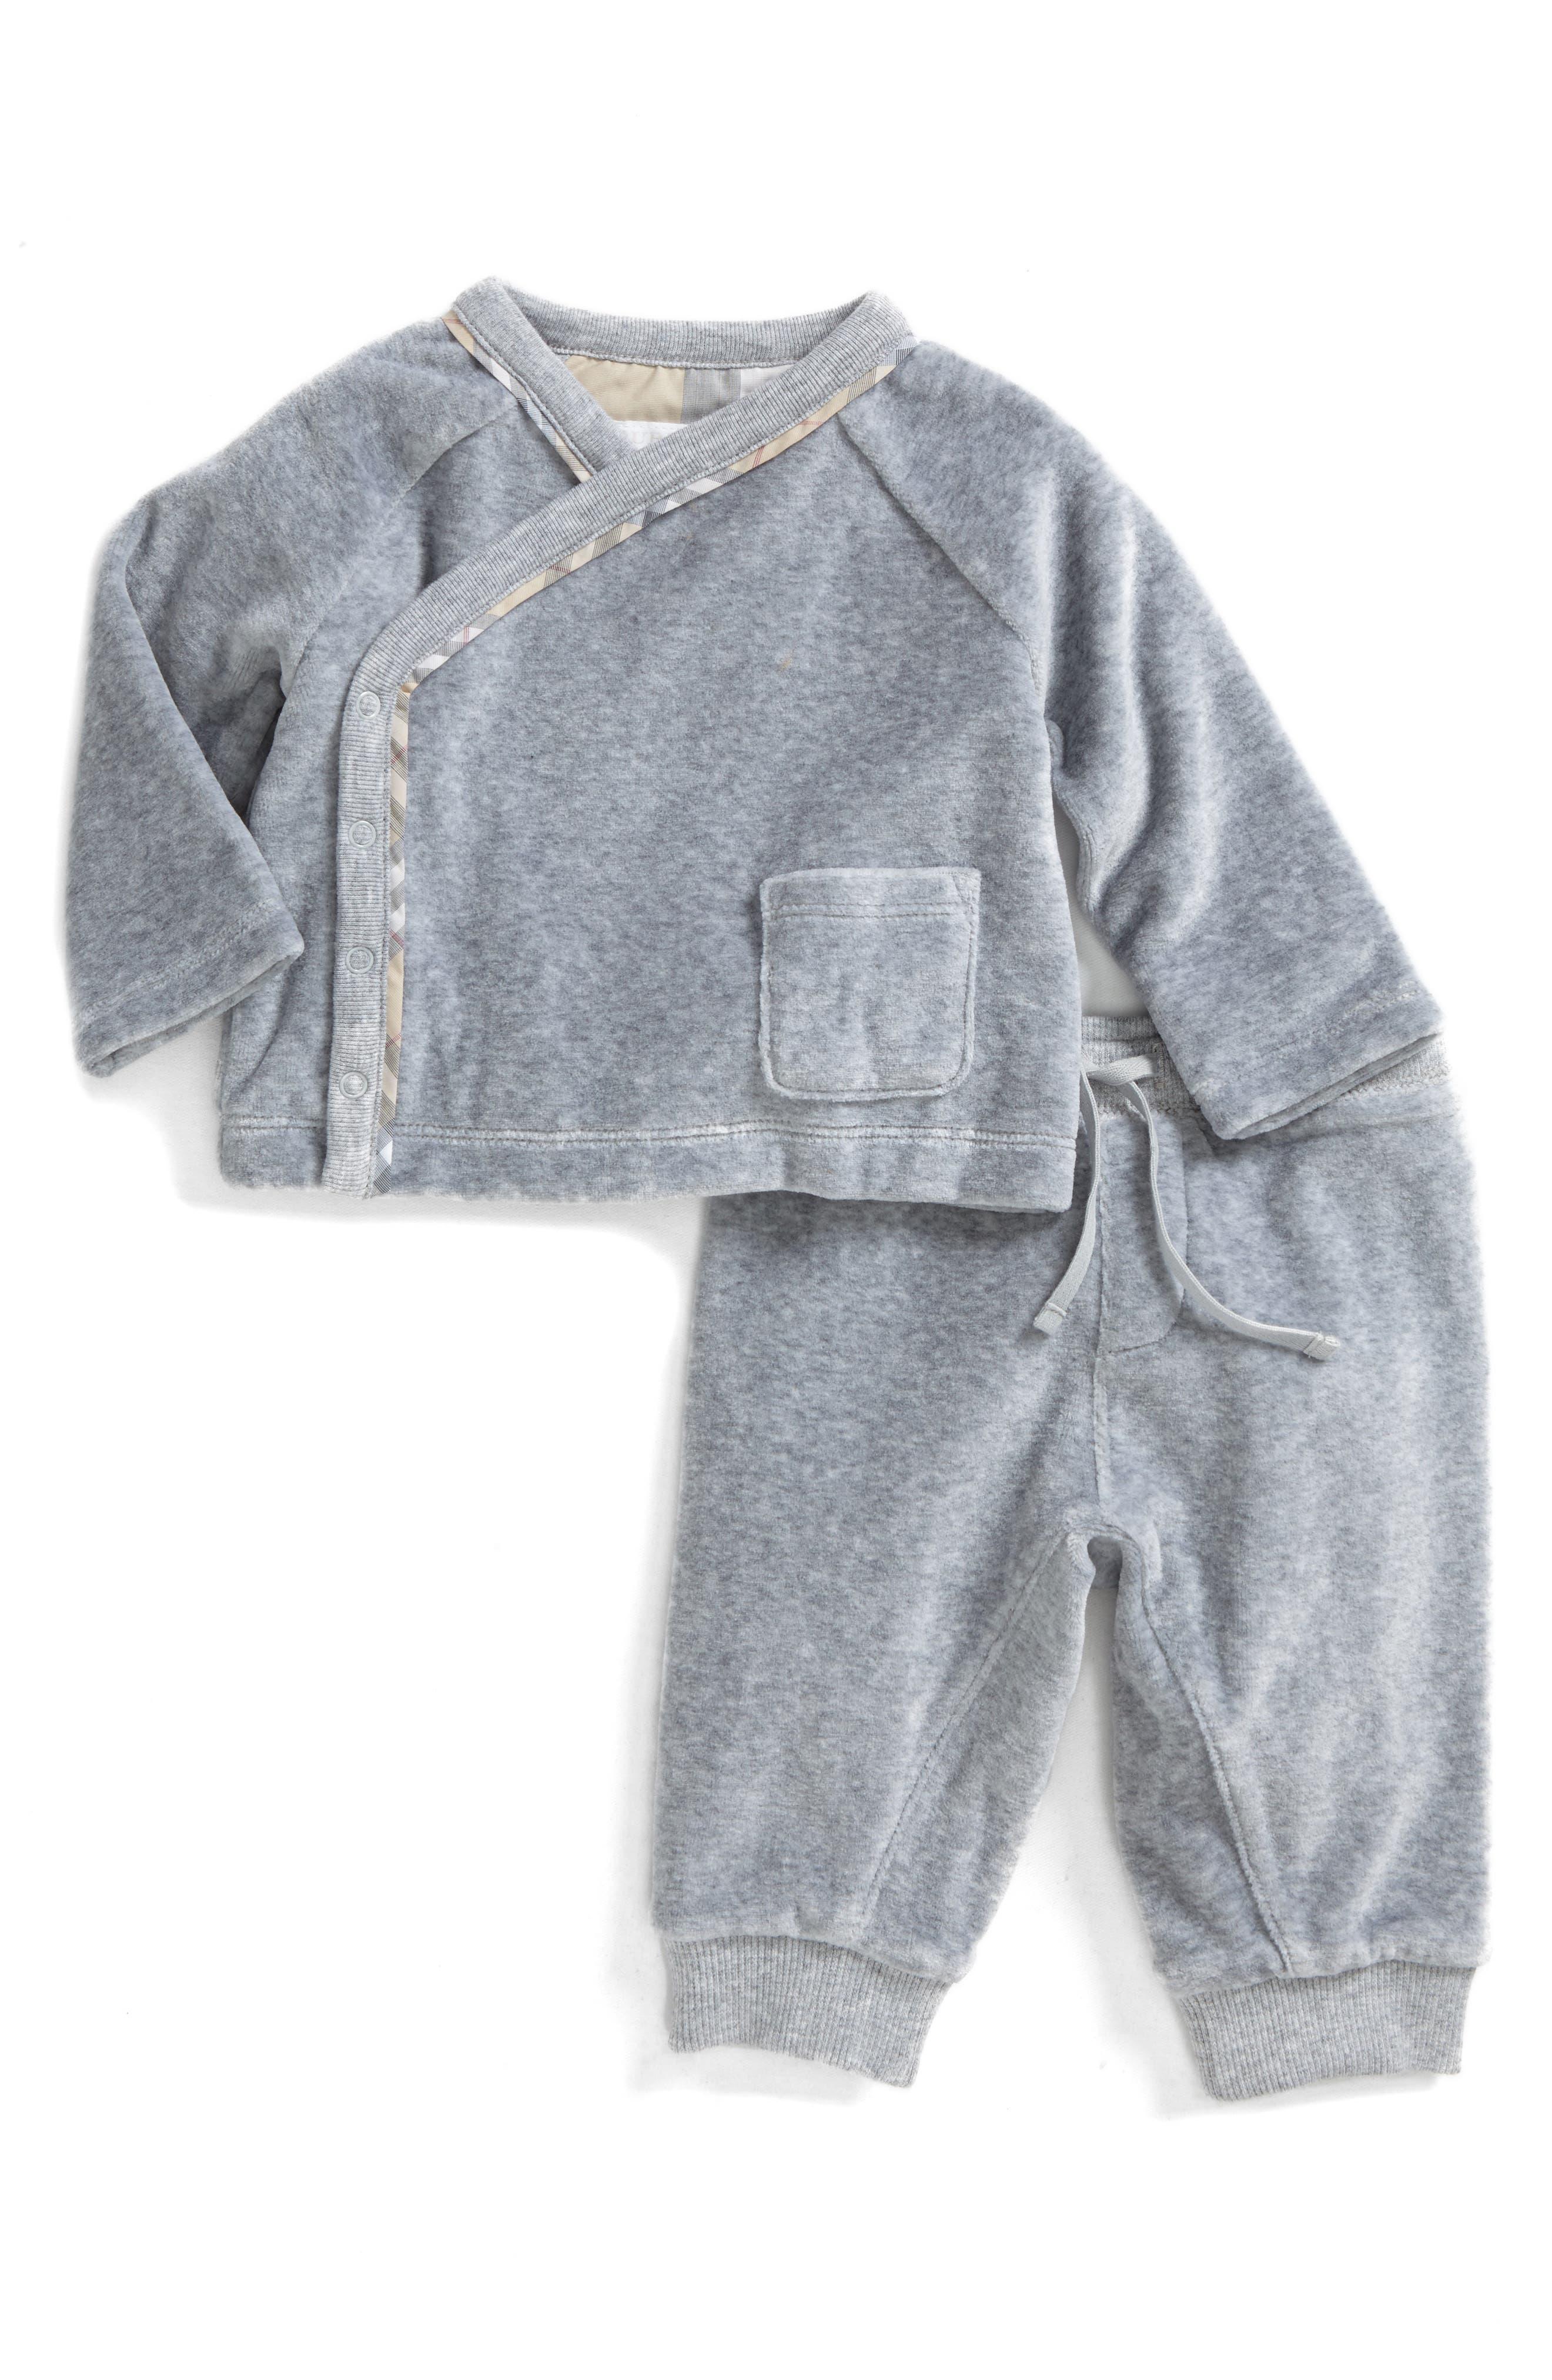 Remy Shirt & Pants Set,                             Main thumbnail 1, color,                             035